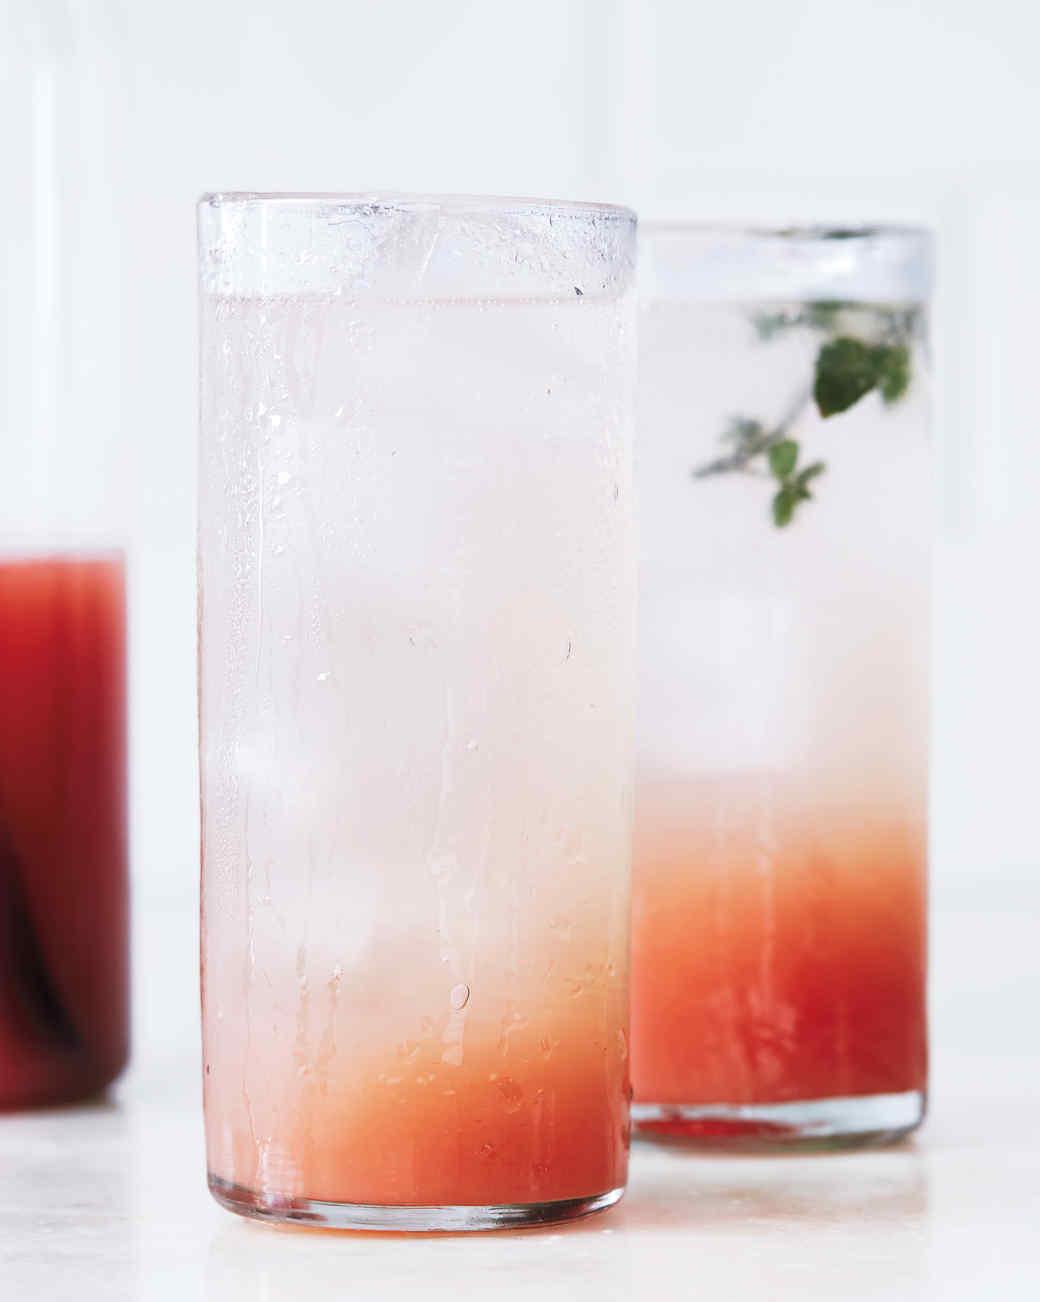 guava-ginger-mint-cocktail-235-d111325.jpg